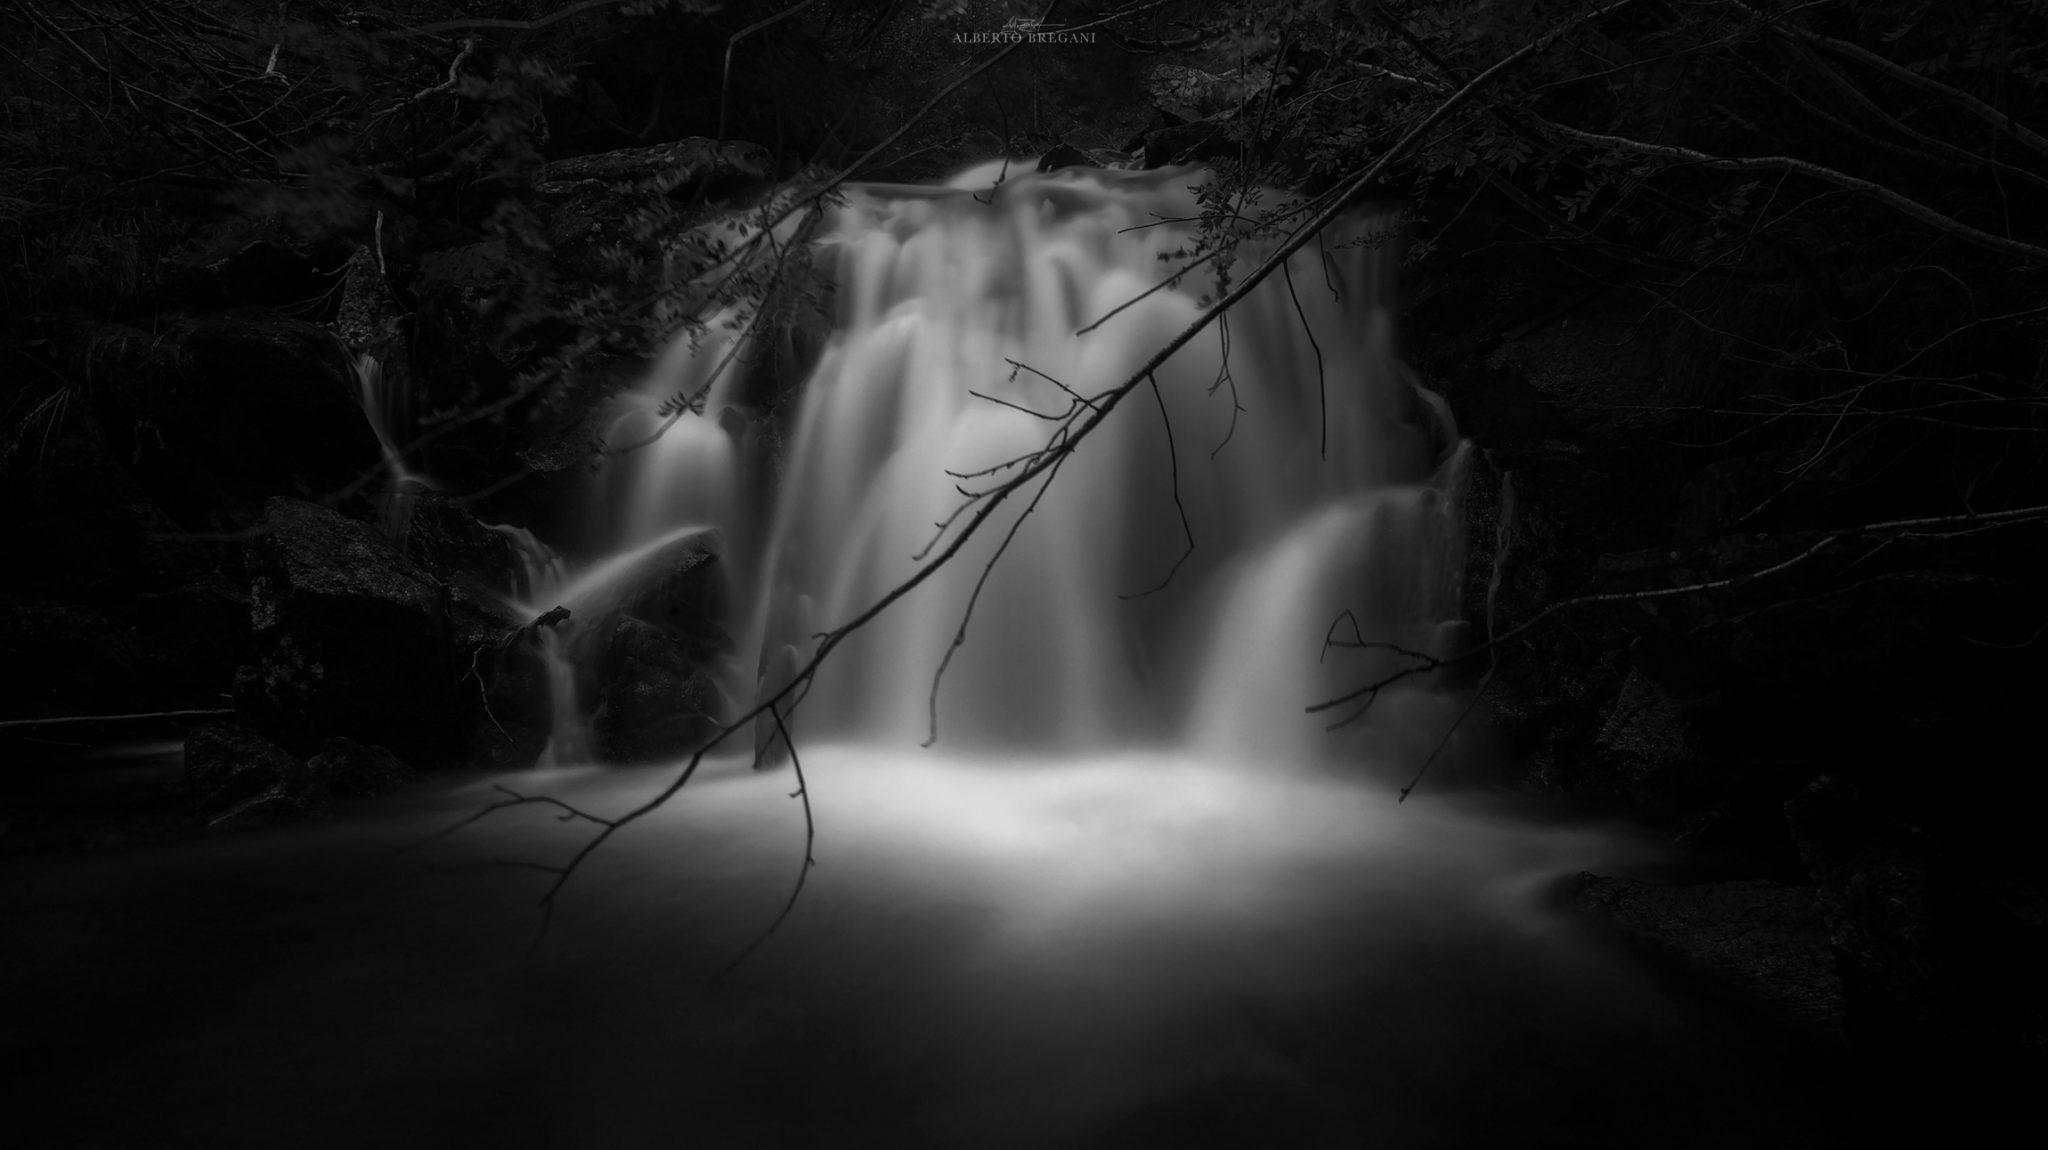 Copyright © Alberto Bregani all rights reserved